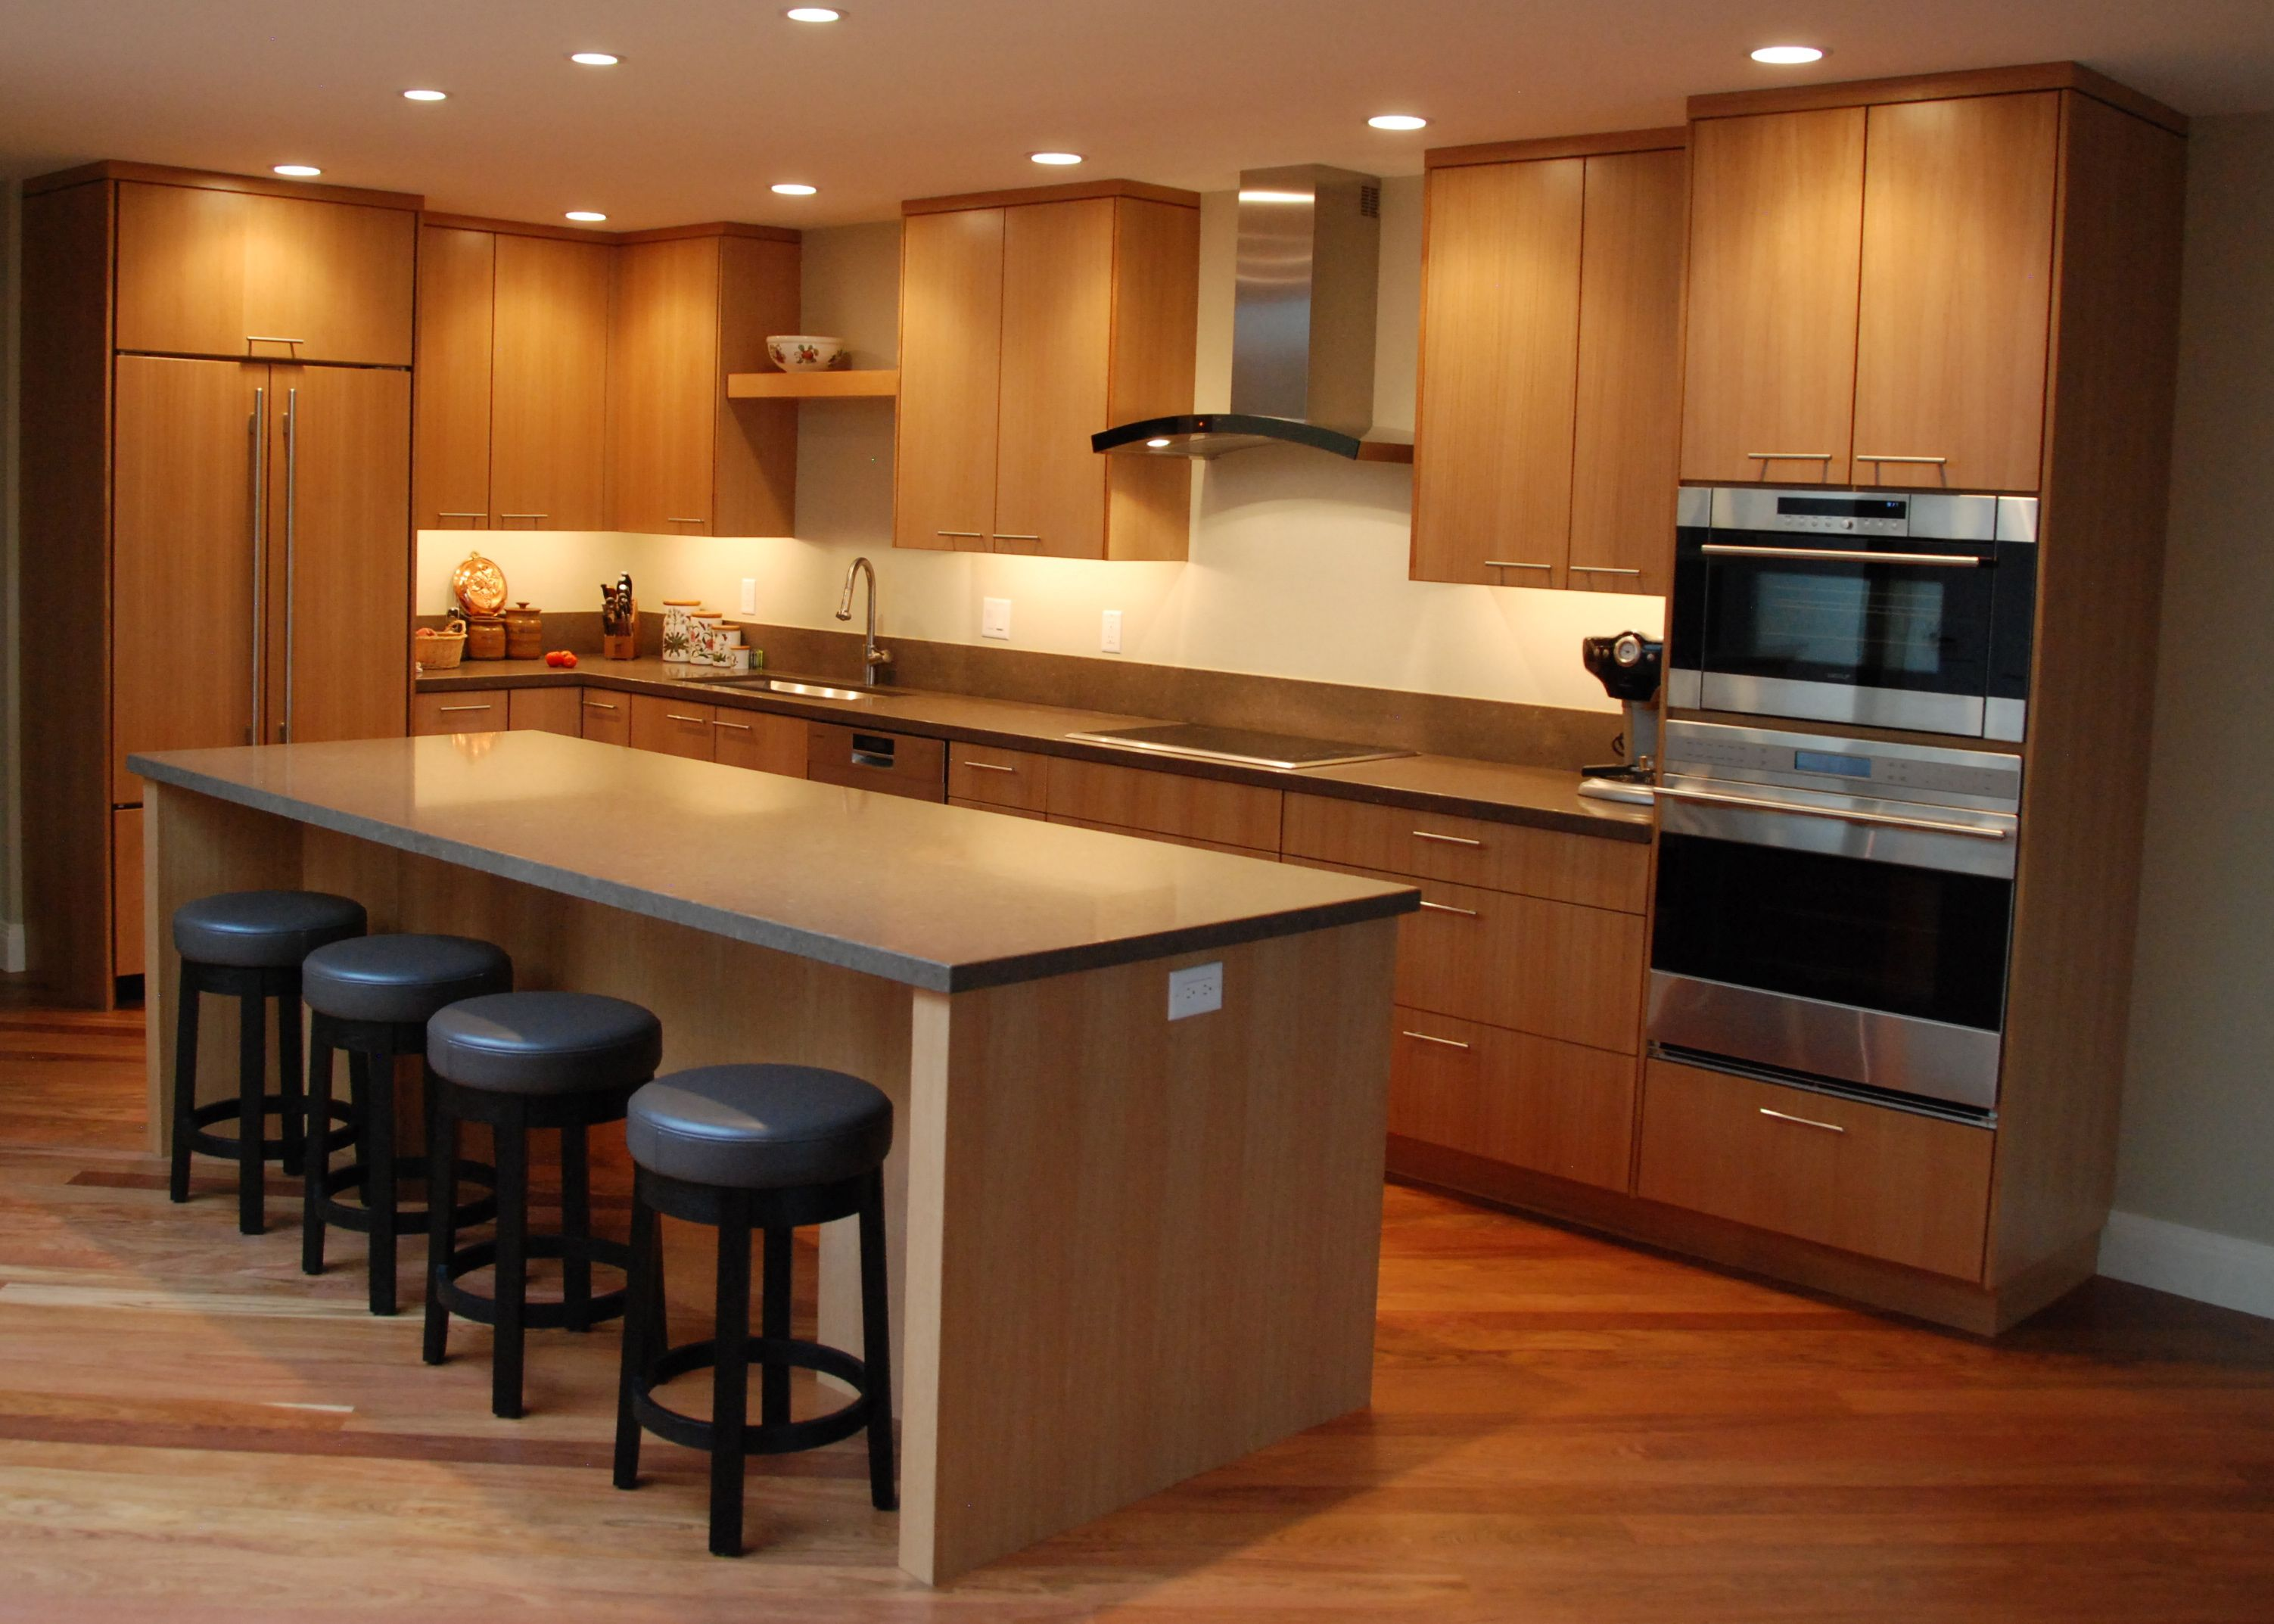 How To Build Kitchen Cabinet Easily  Kitchen  Pinterest Inspiration Small Kitchen Design Ideas 2014 2018